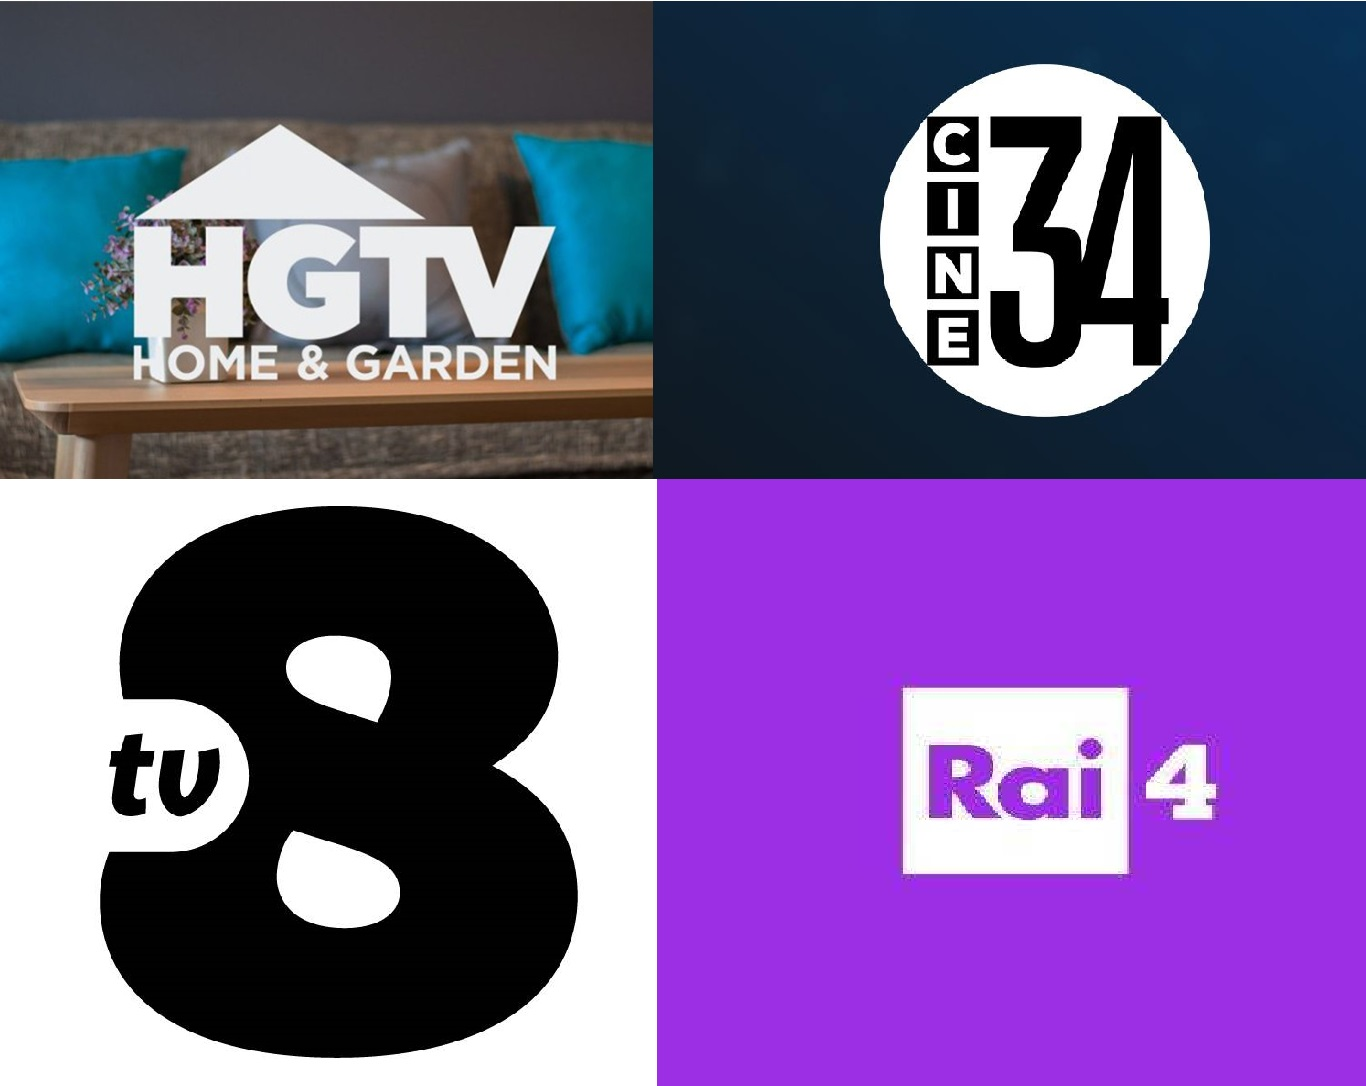 canali tematici